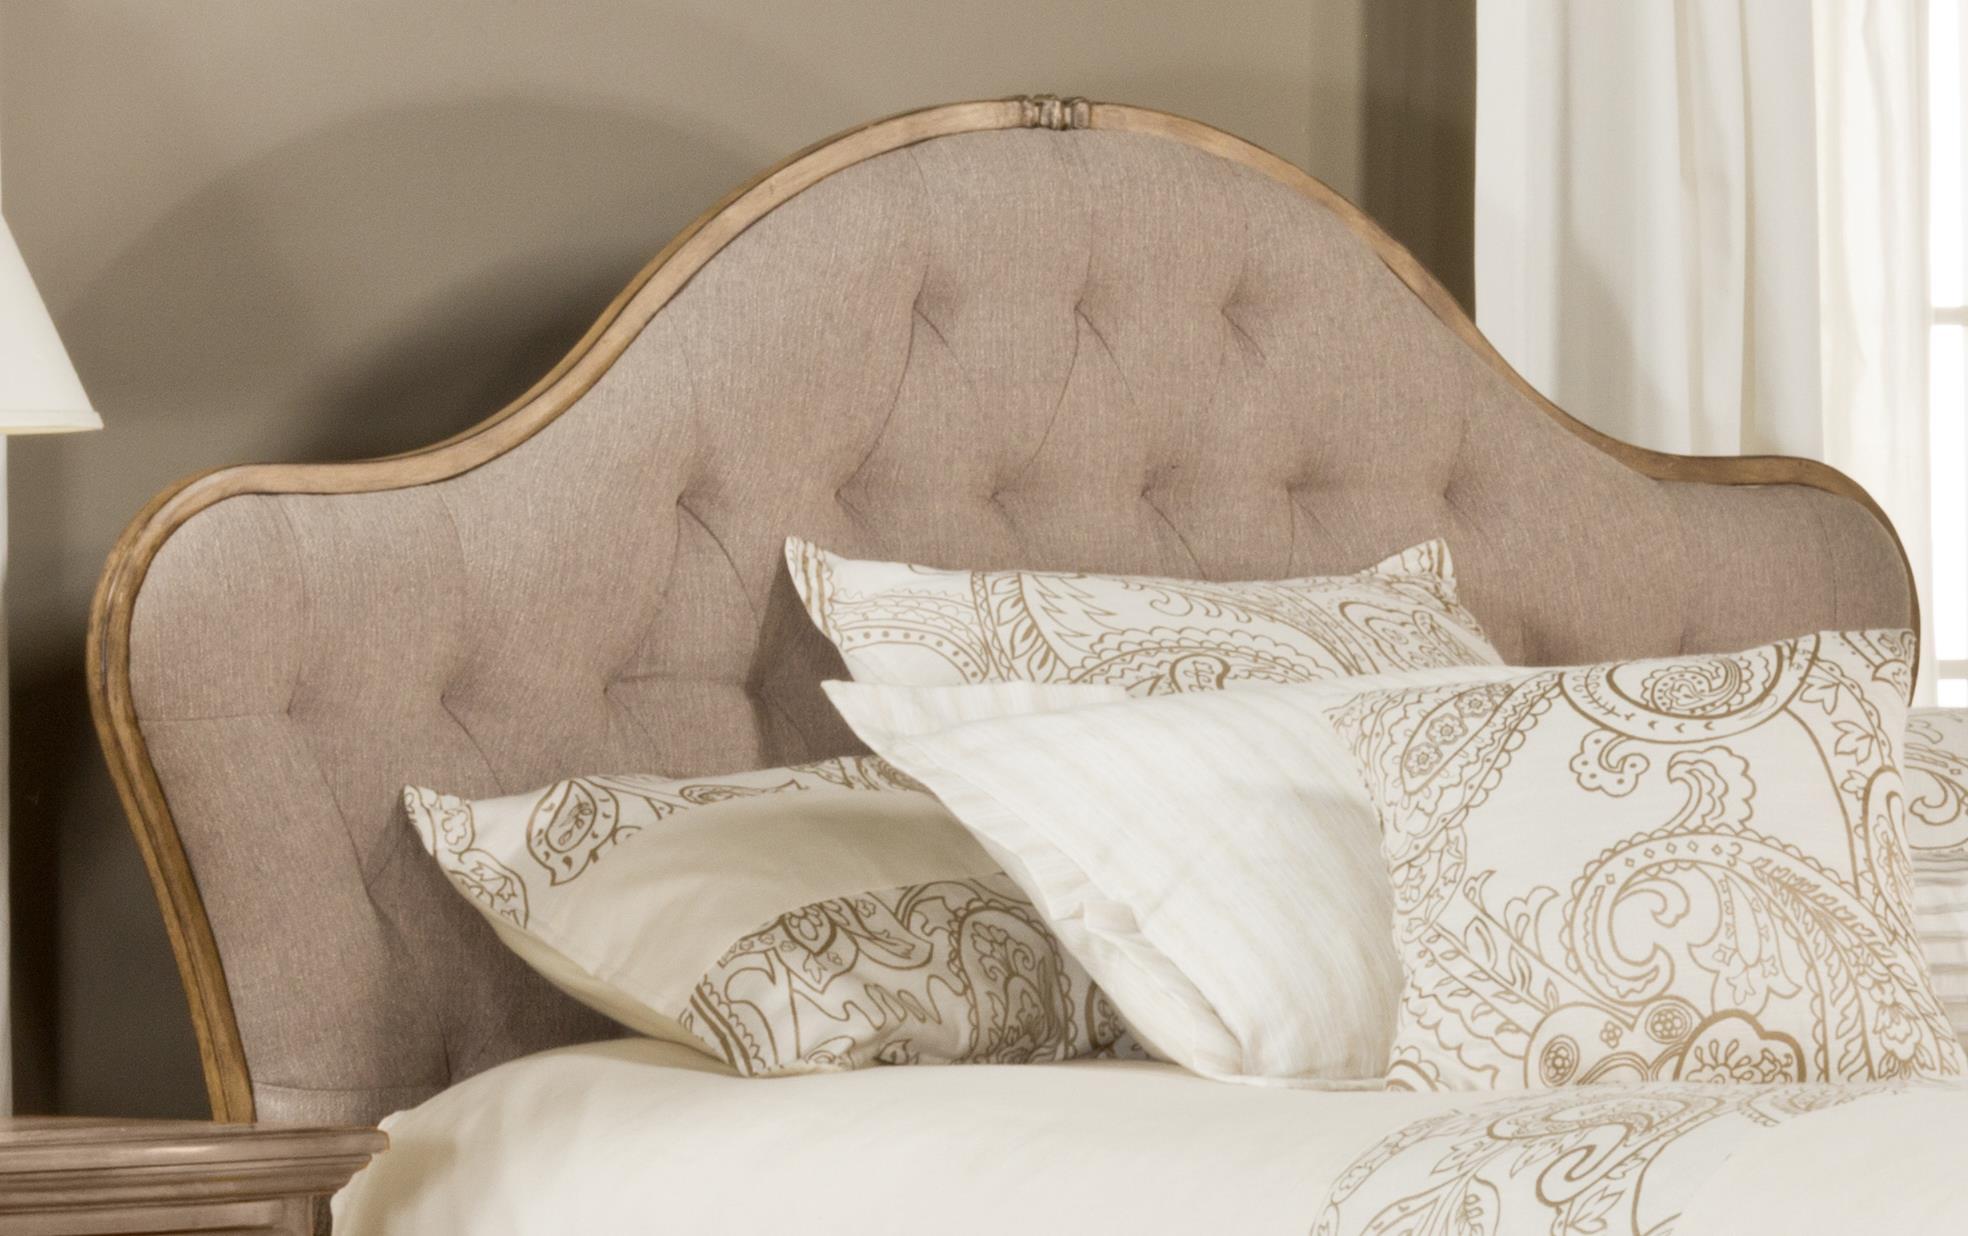 Hillsdale Upholstered Beds Jefferson King Headboard - Item Number: 1206-670